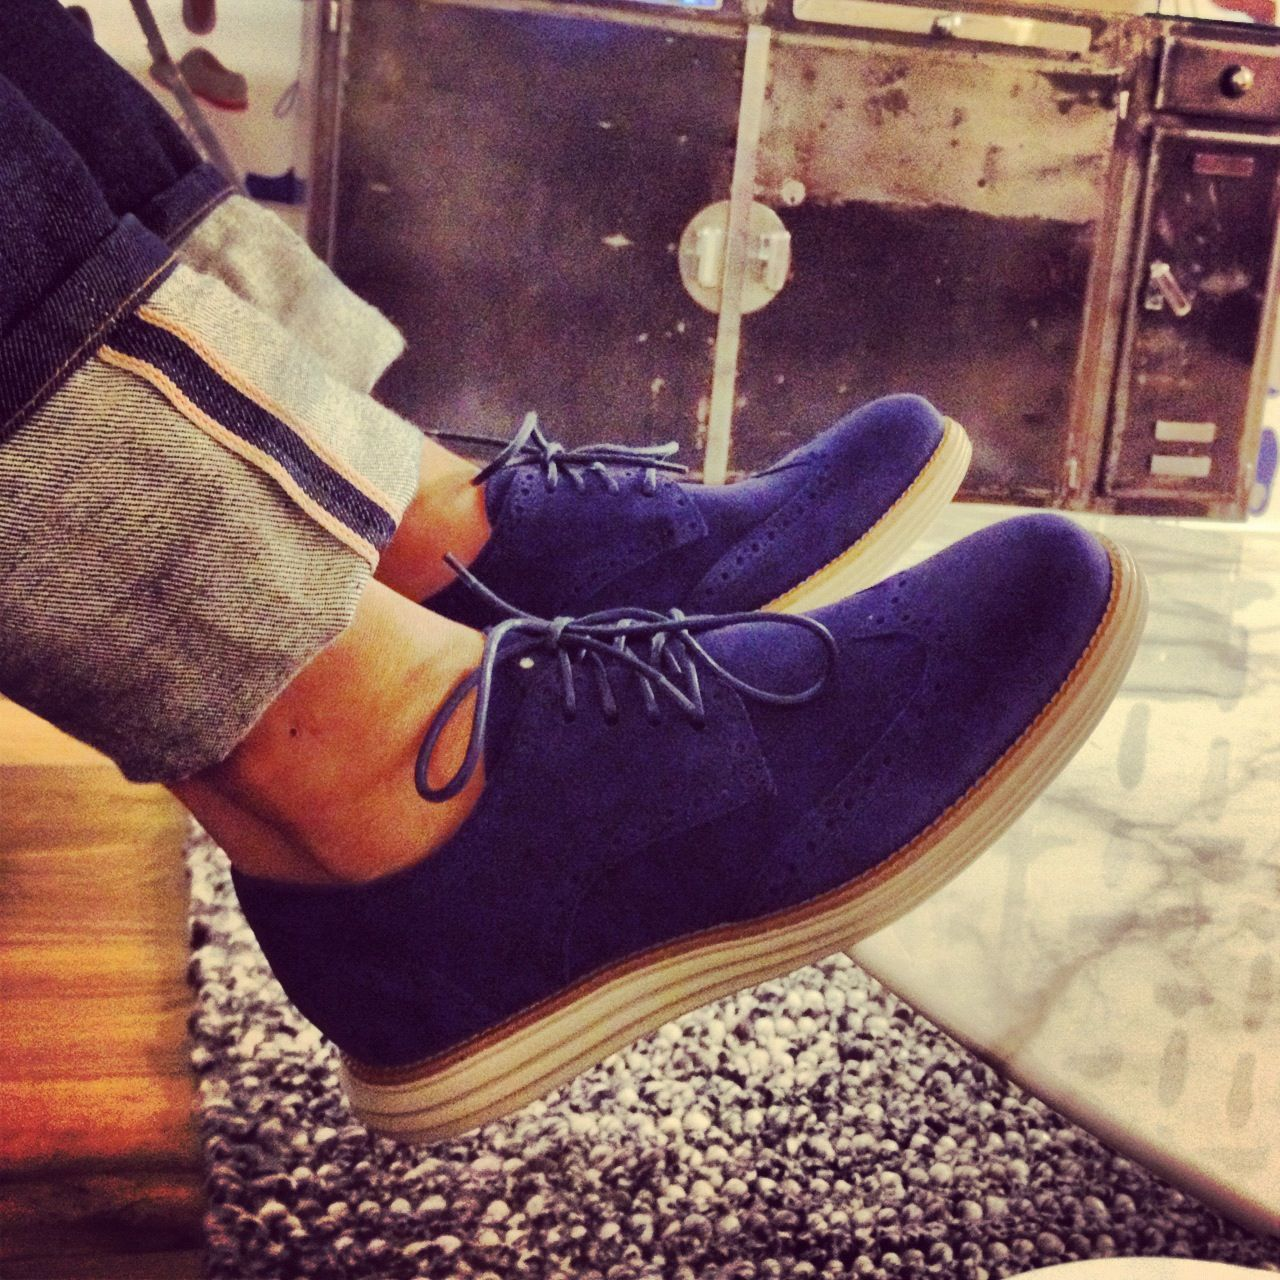 Cole Haan LunarGrand Wingtip · Cole HaanShoes MenStyle ...